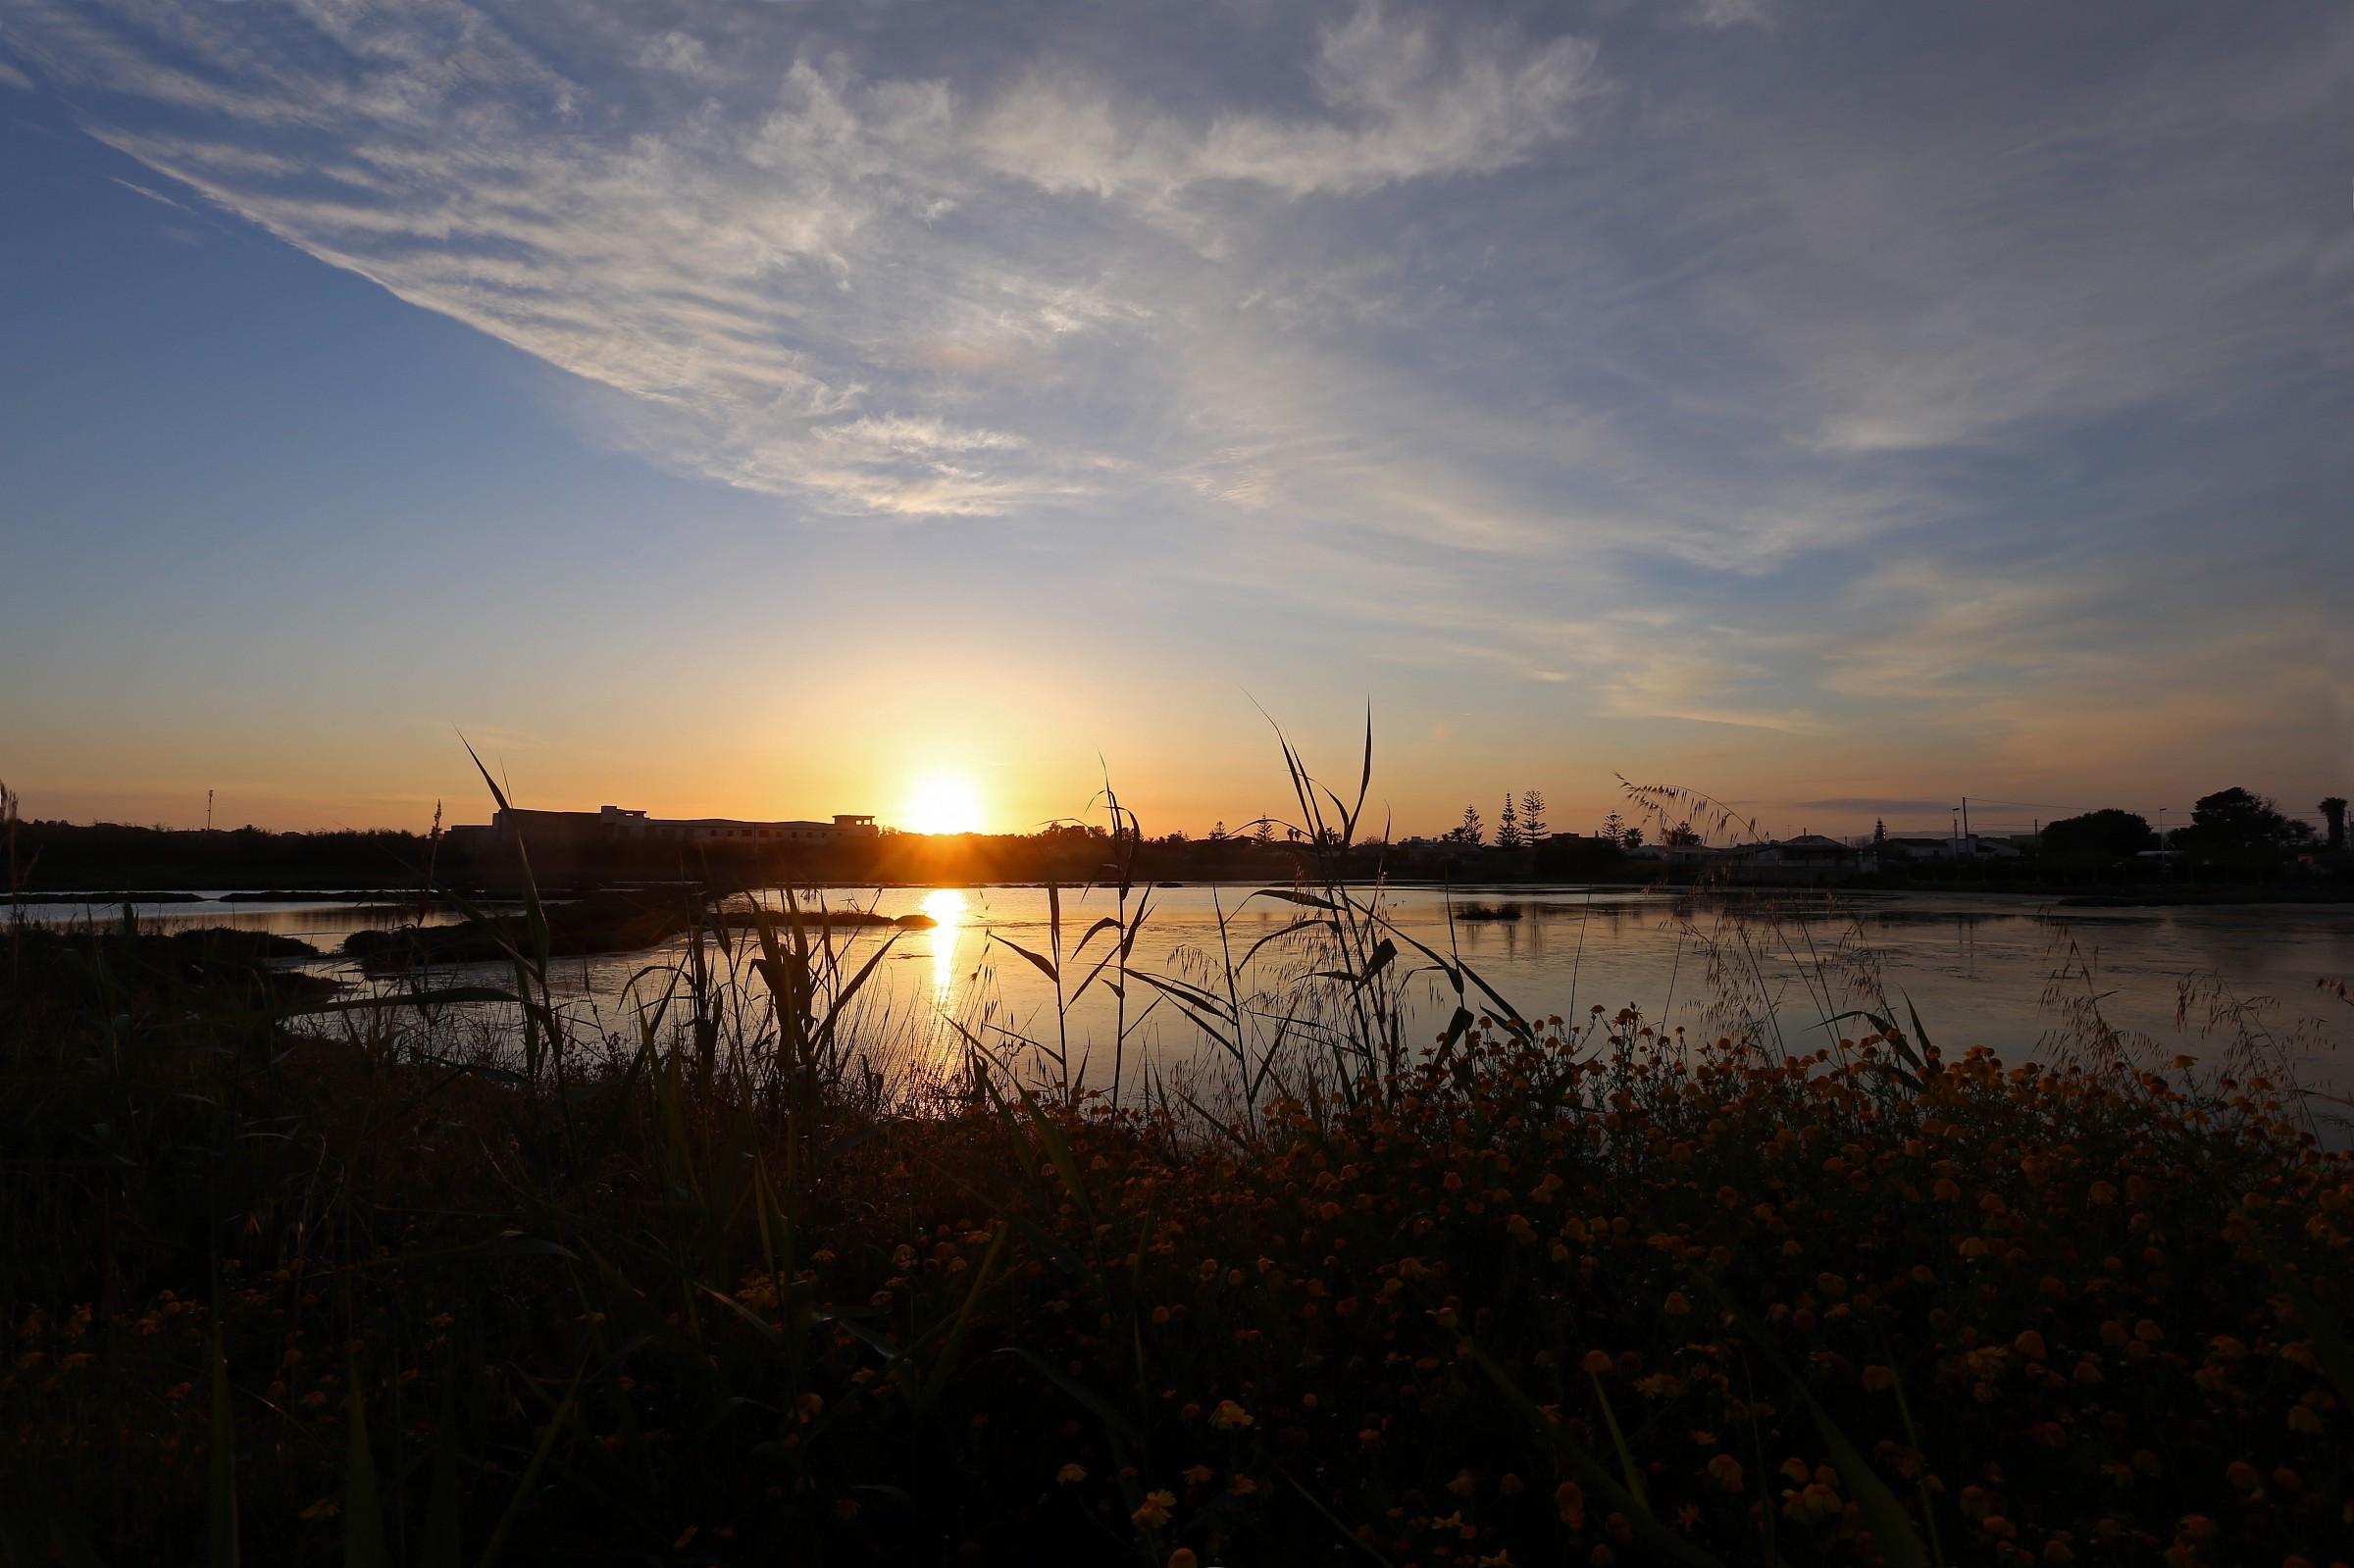 sunset on the pond...